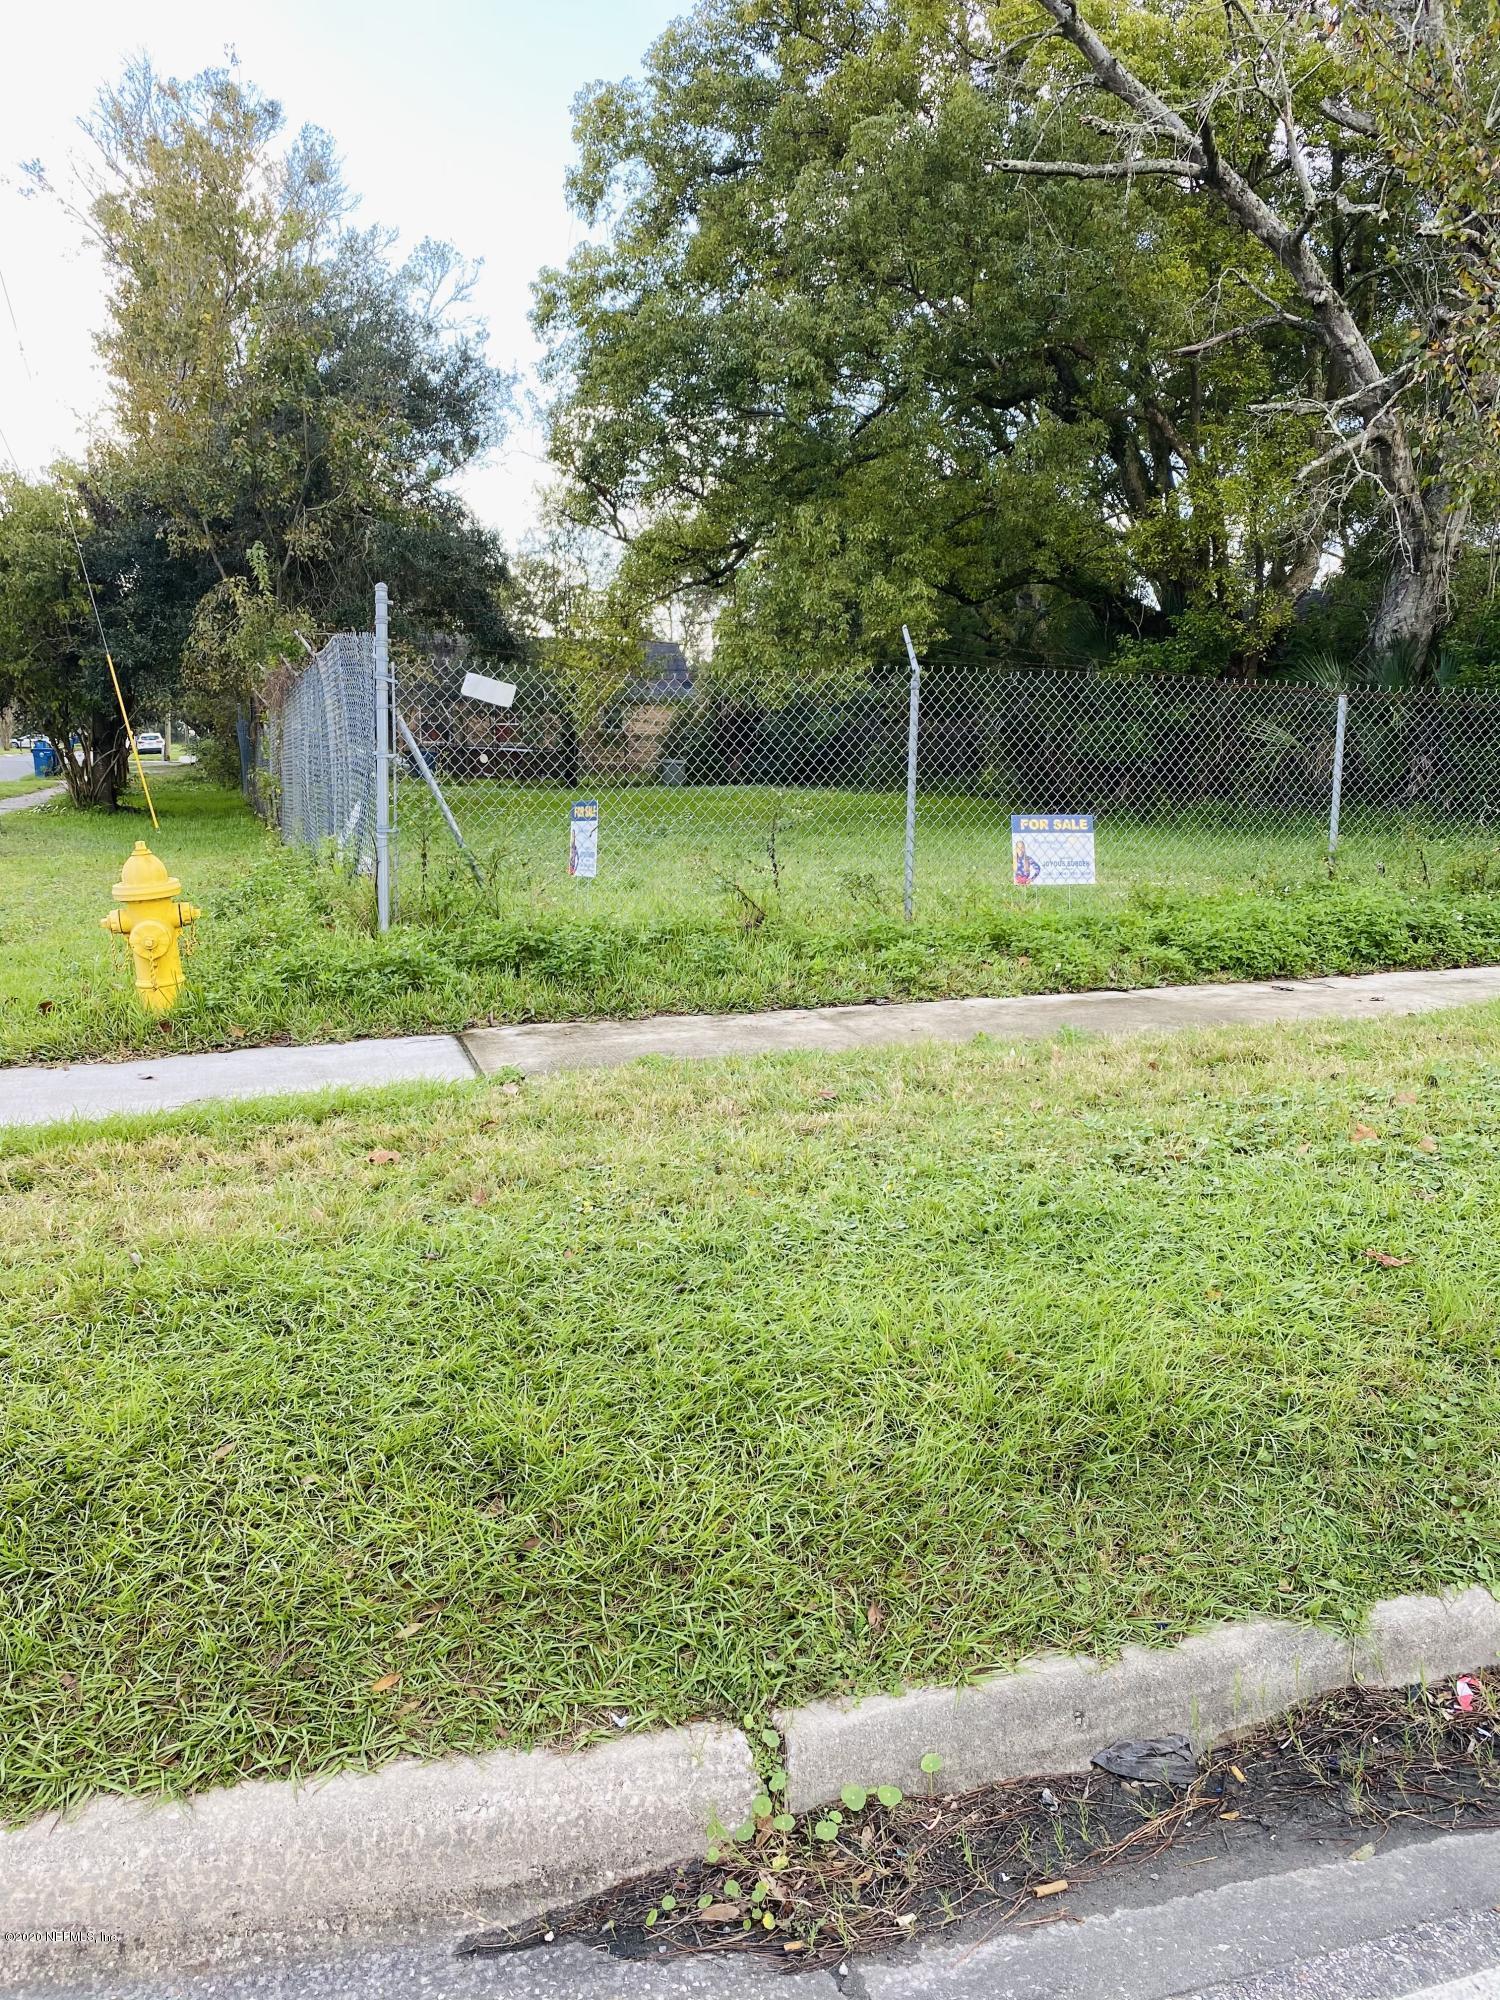 1811 VOORHIES, JACKSONVILLE, FLORIDA 32209, ,Vacant land,For sale,VOORHIES,1081822